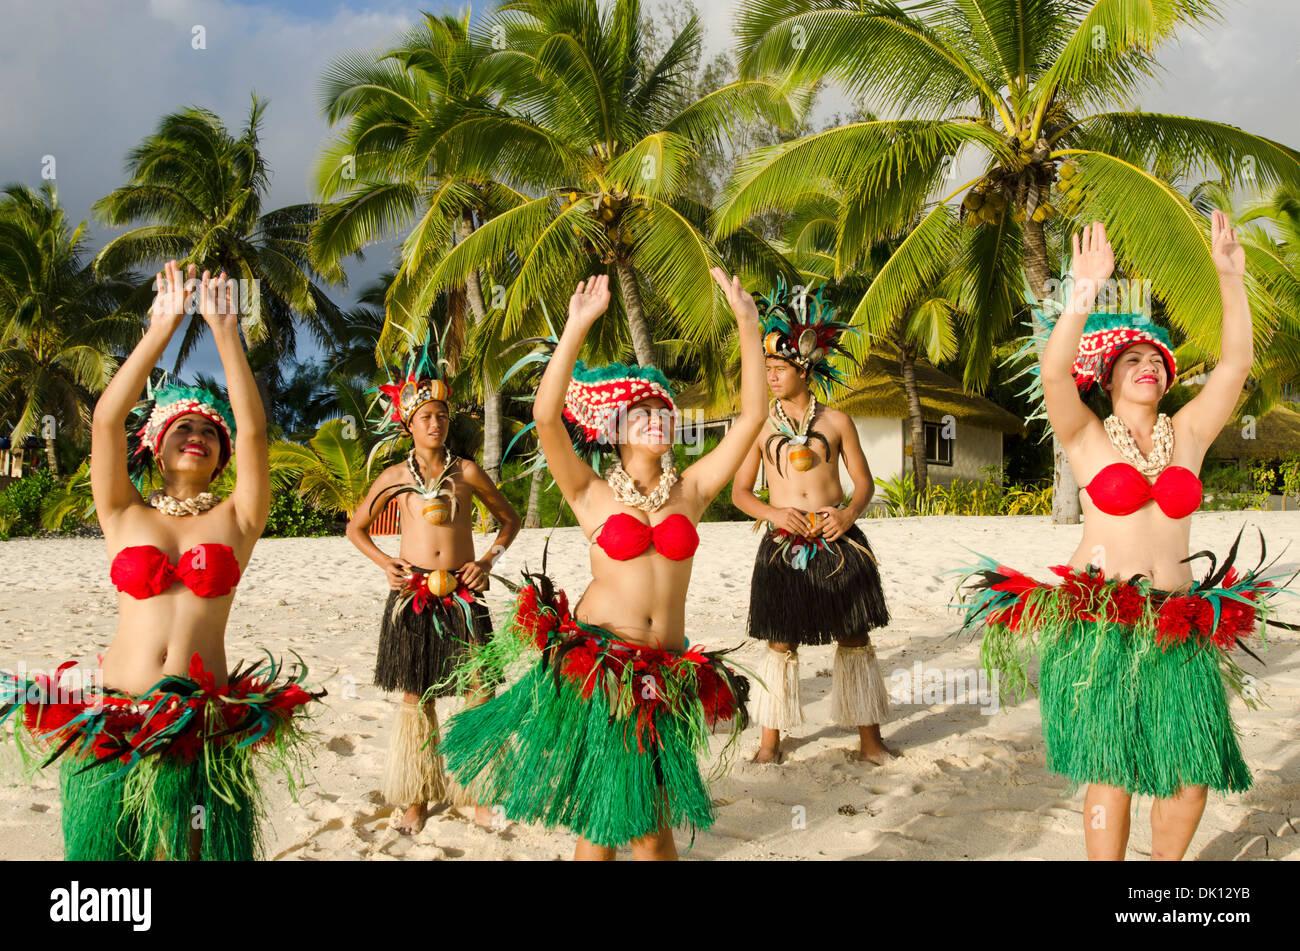 Is Hawaii An Island Or The Group Of Islands